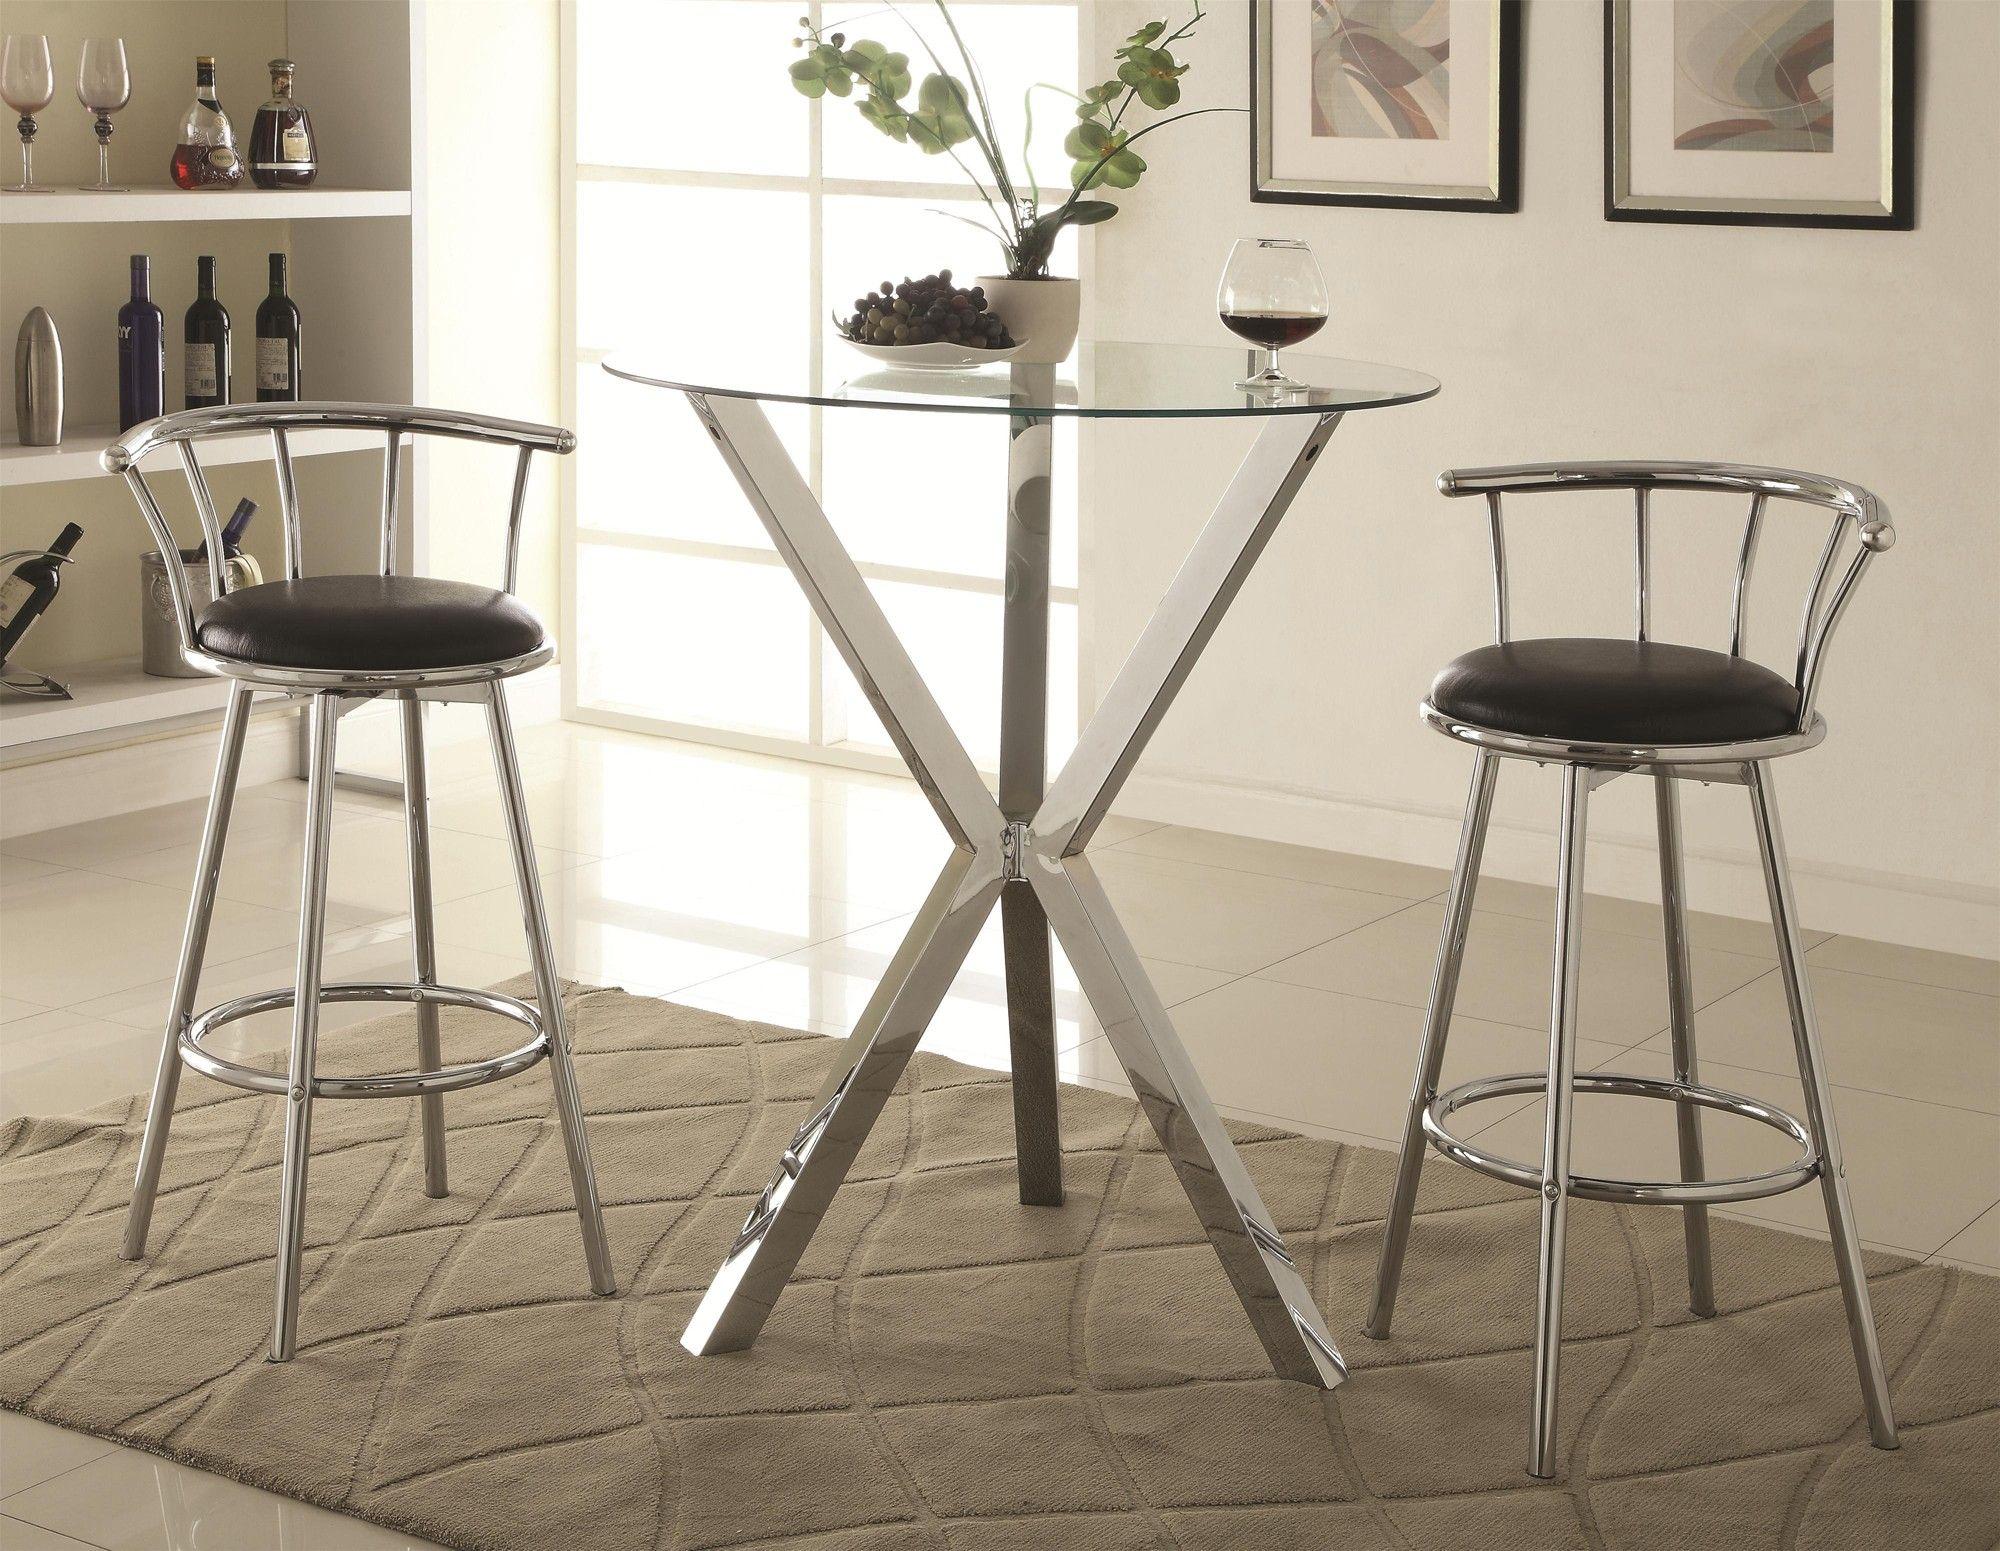 3 Piece Round Glass Top Chrome Base Table Swivel Bar Stool Set